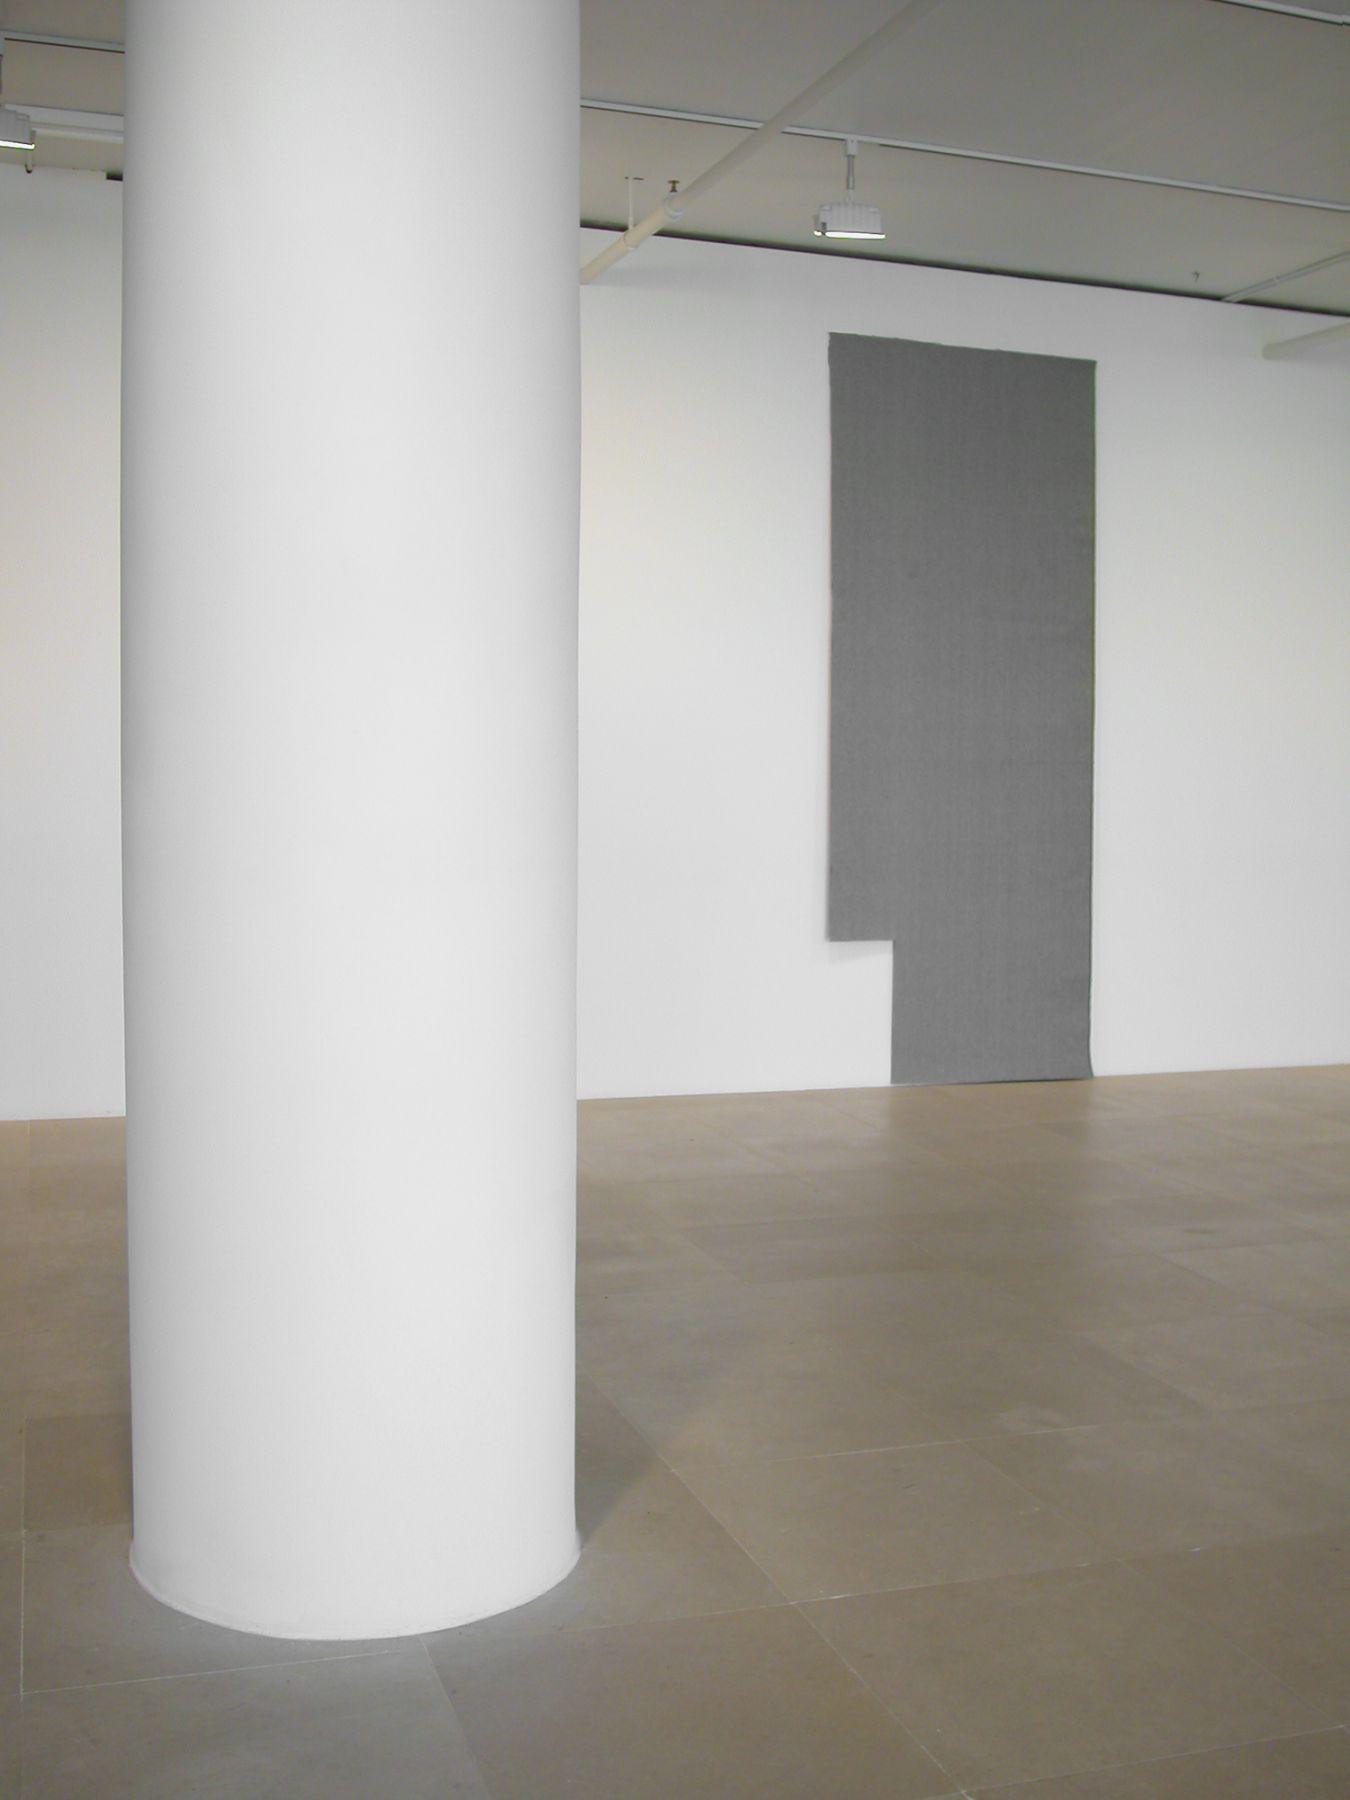 Gedi Sibony, Untitled, 2007, Carpet, 124 x 49 inches (315 x 124.5 cm)